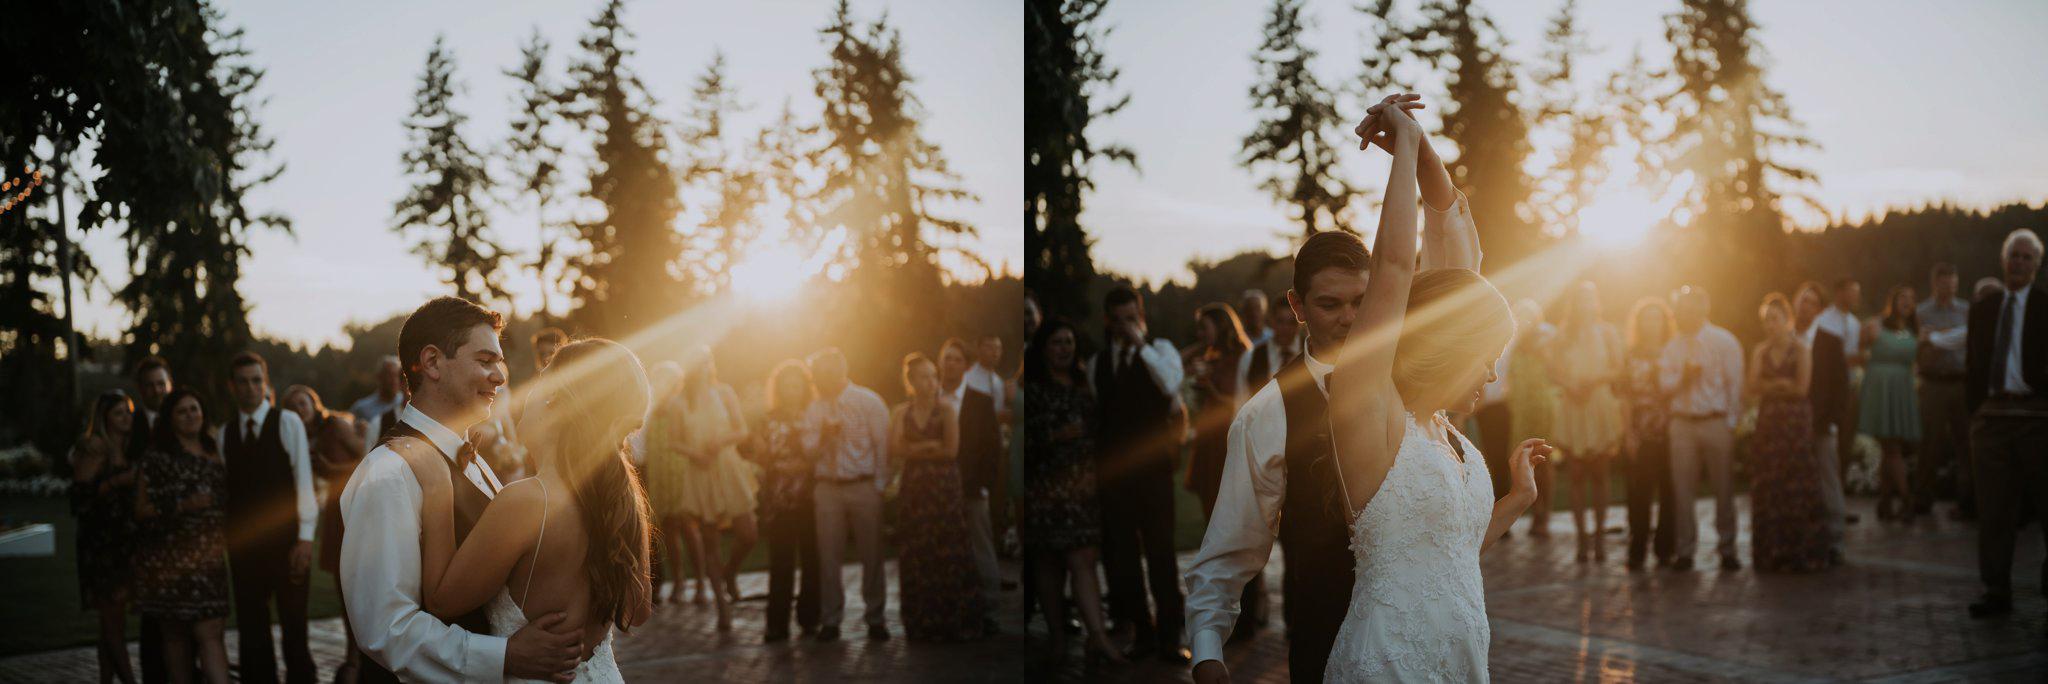 kristen-and-cody-the-kelley-farm-wedding-seattle-photographer-caitlyn-nikula-103.jpg